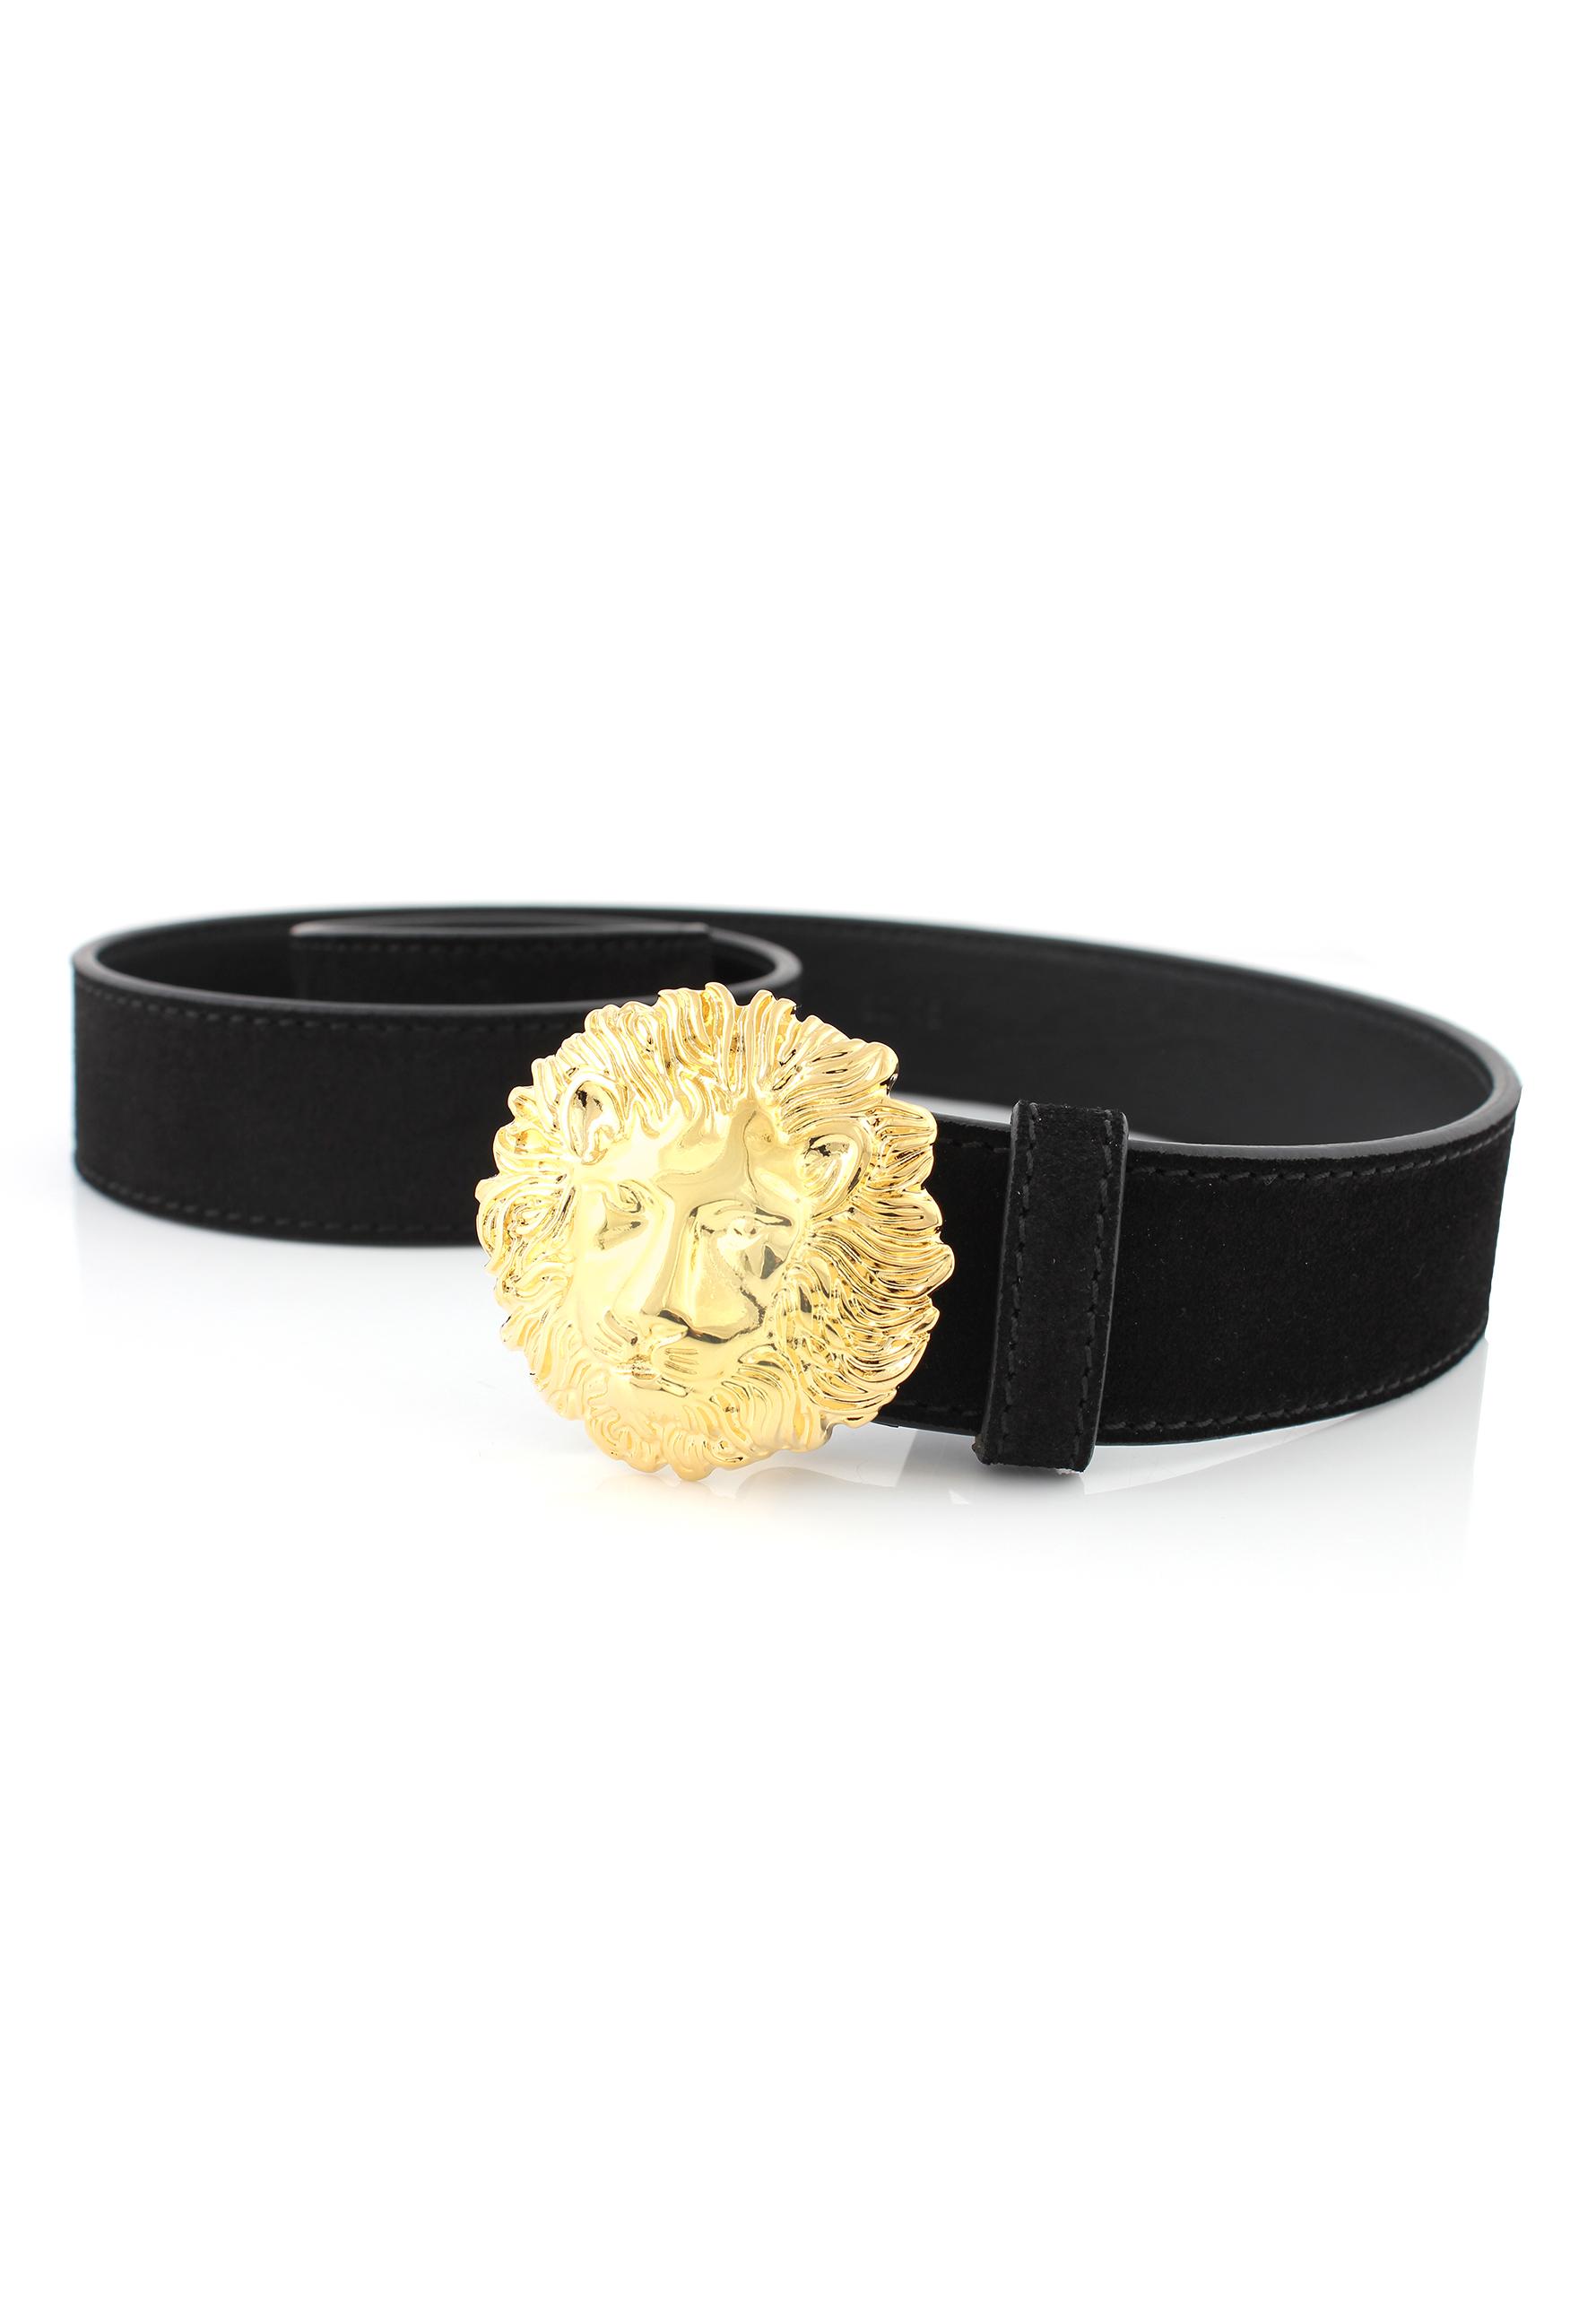 lion head buckle belt - Black Versus 62hHQm